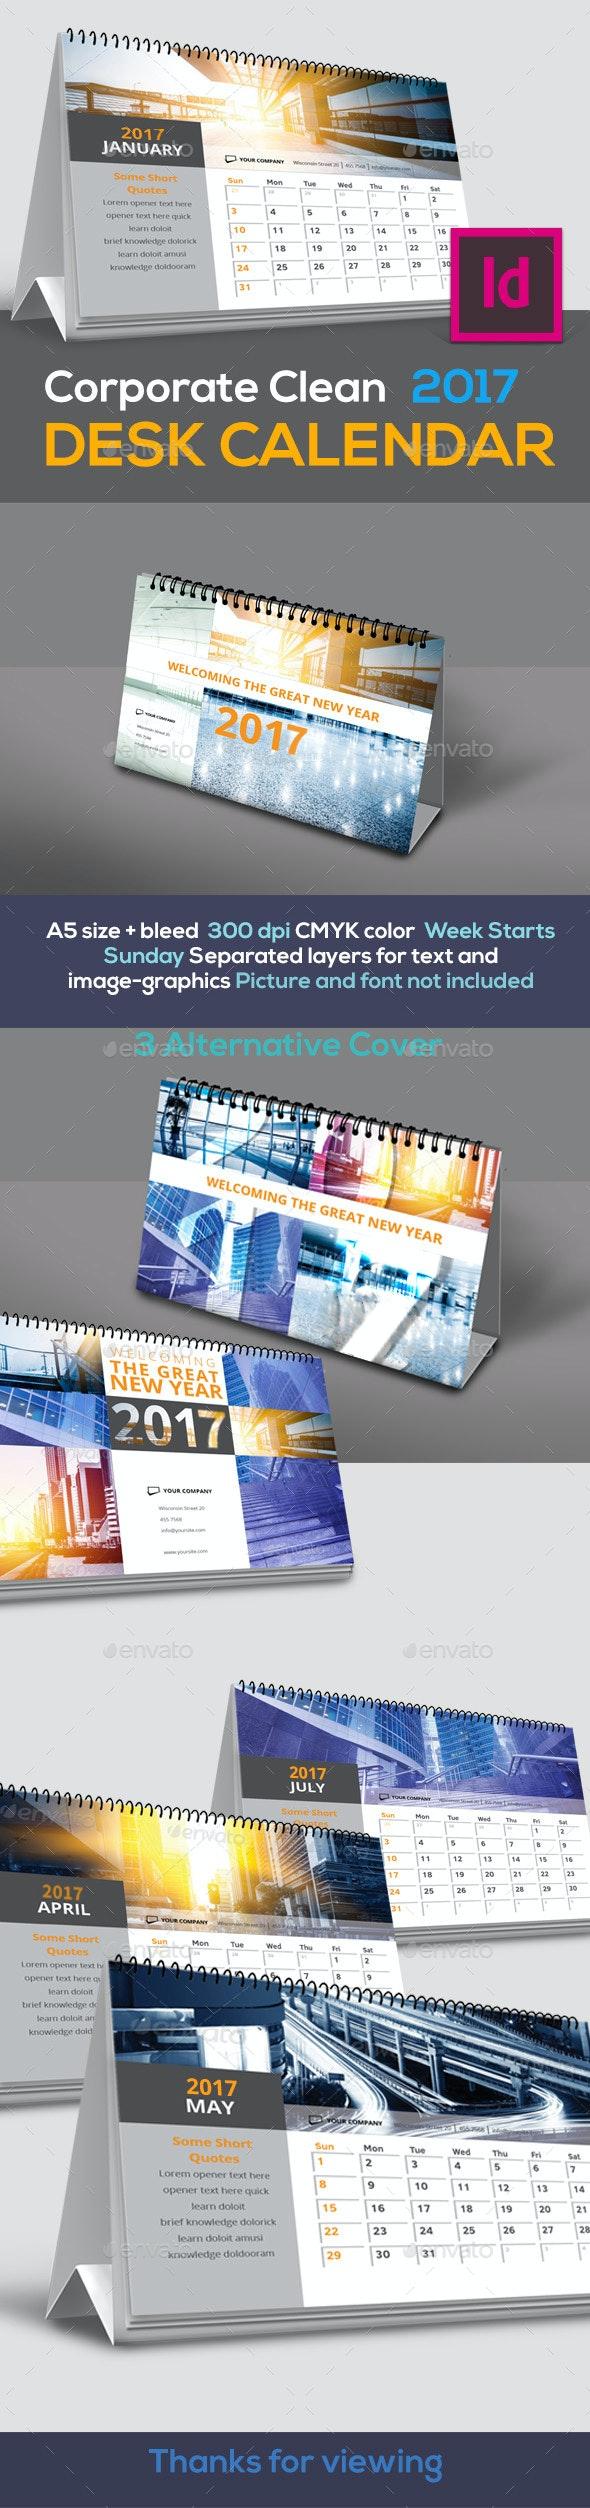 Corporate Desk Calendar 2017 - Calendars Stationery